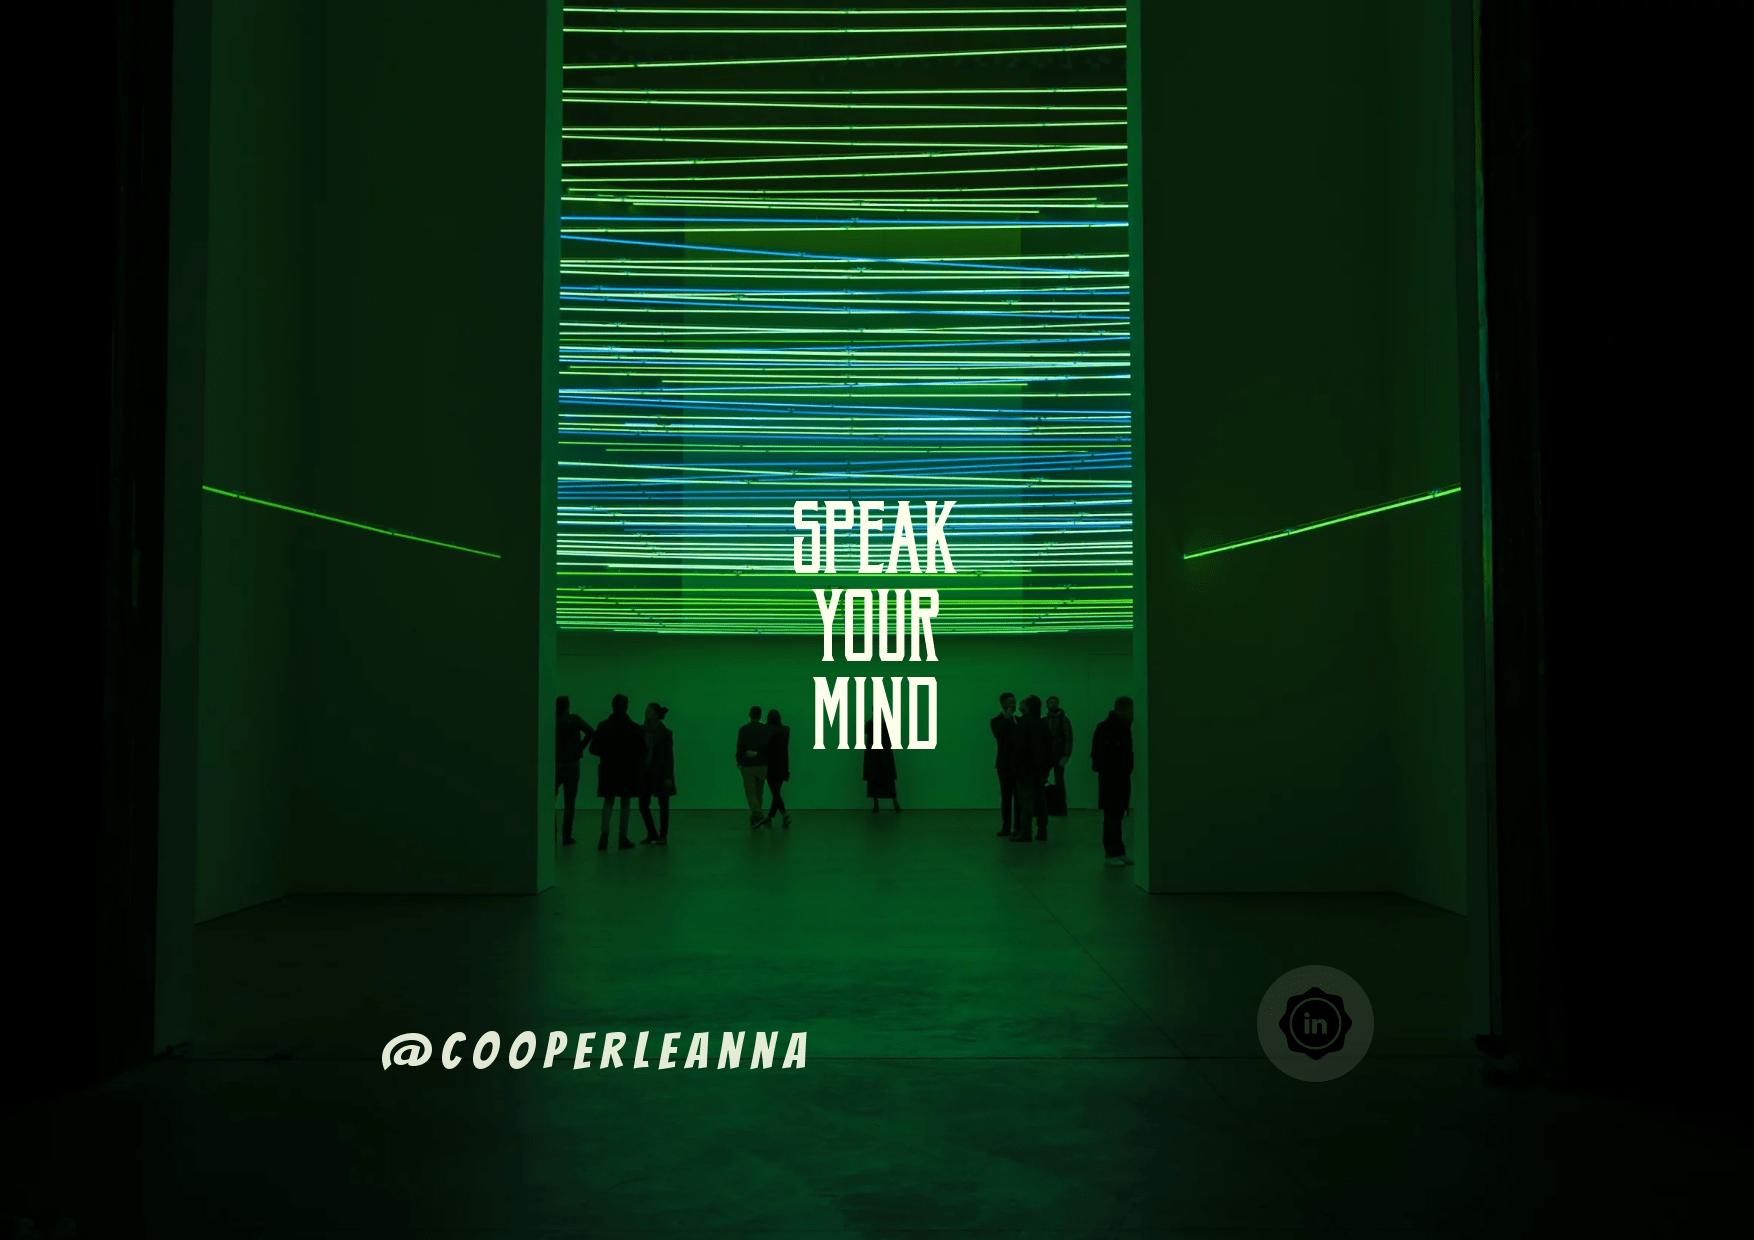 Green,                Light,                Technology,                Darkness,                Computer,                Wallpaper,                Font,                Midnight,                Laser,                Phenomenon,                Social,                Geometric,                In,                 Free Image